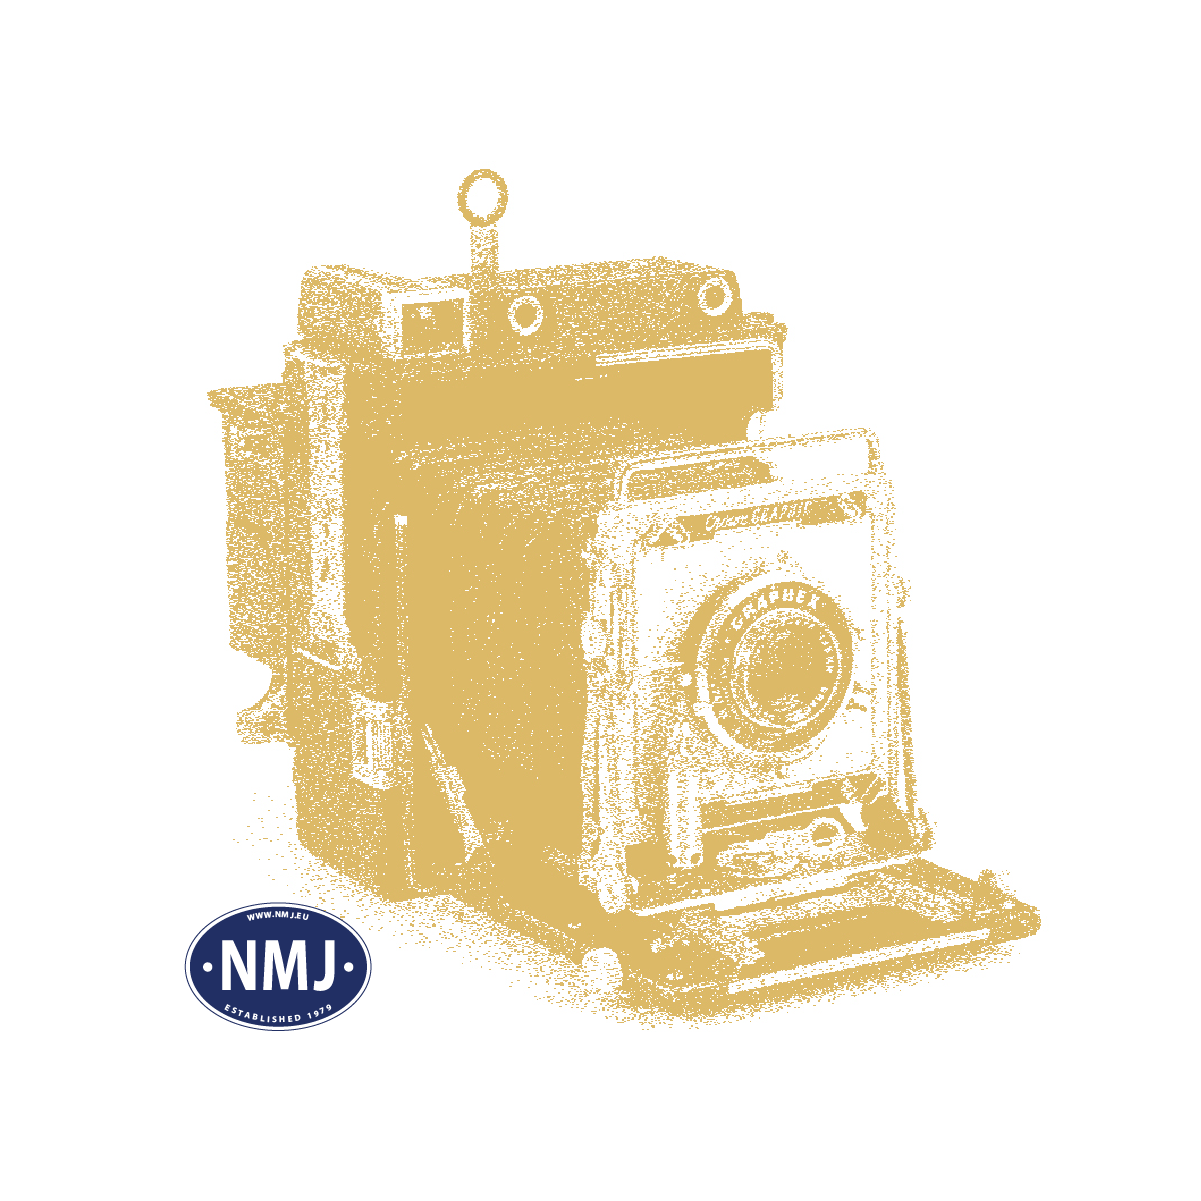 NMJT245301 - NMJ Topline CFL 1602, 0-Skala, DCC m/ Lyd